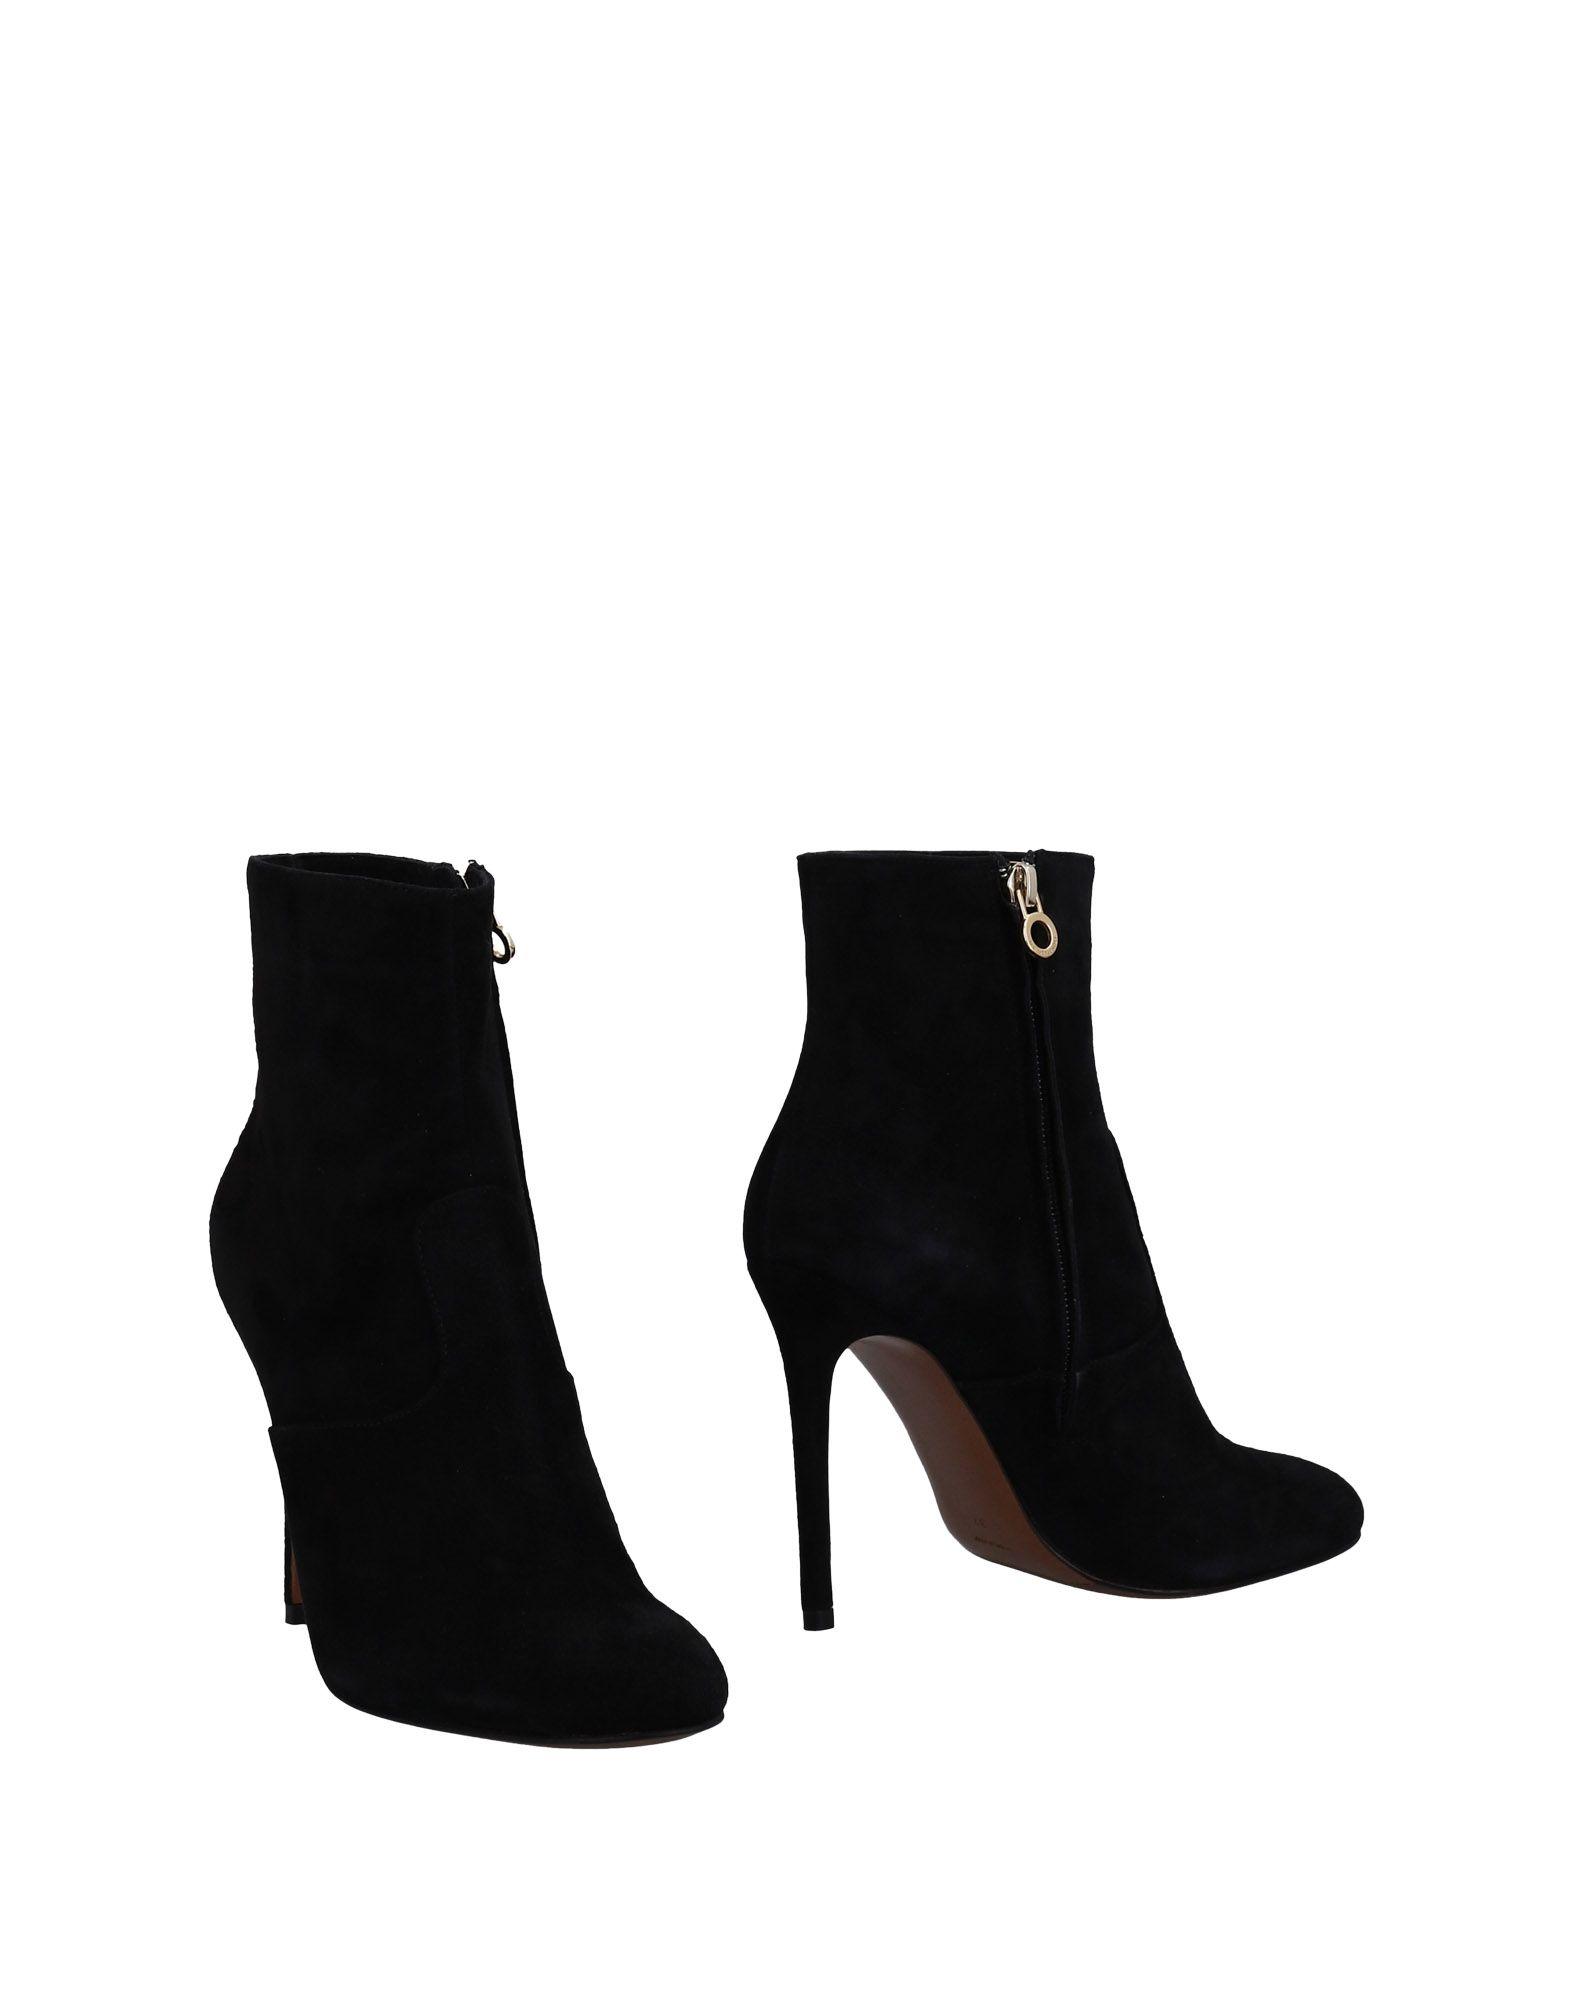 L' Autre Chose Stiefelette Damen  11485067BFGut aussehende strapazierfähige Schuhe